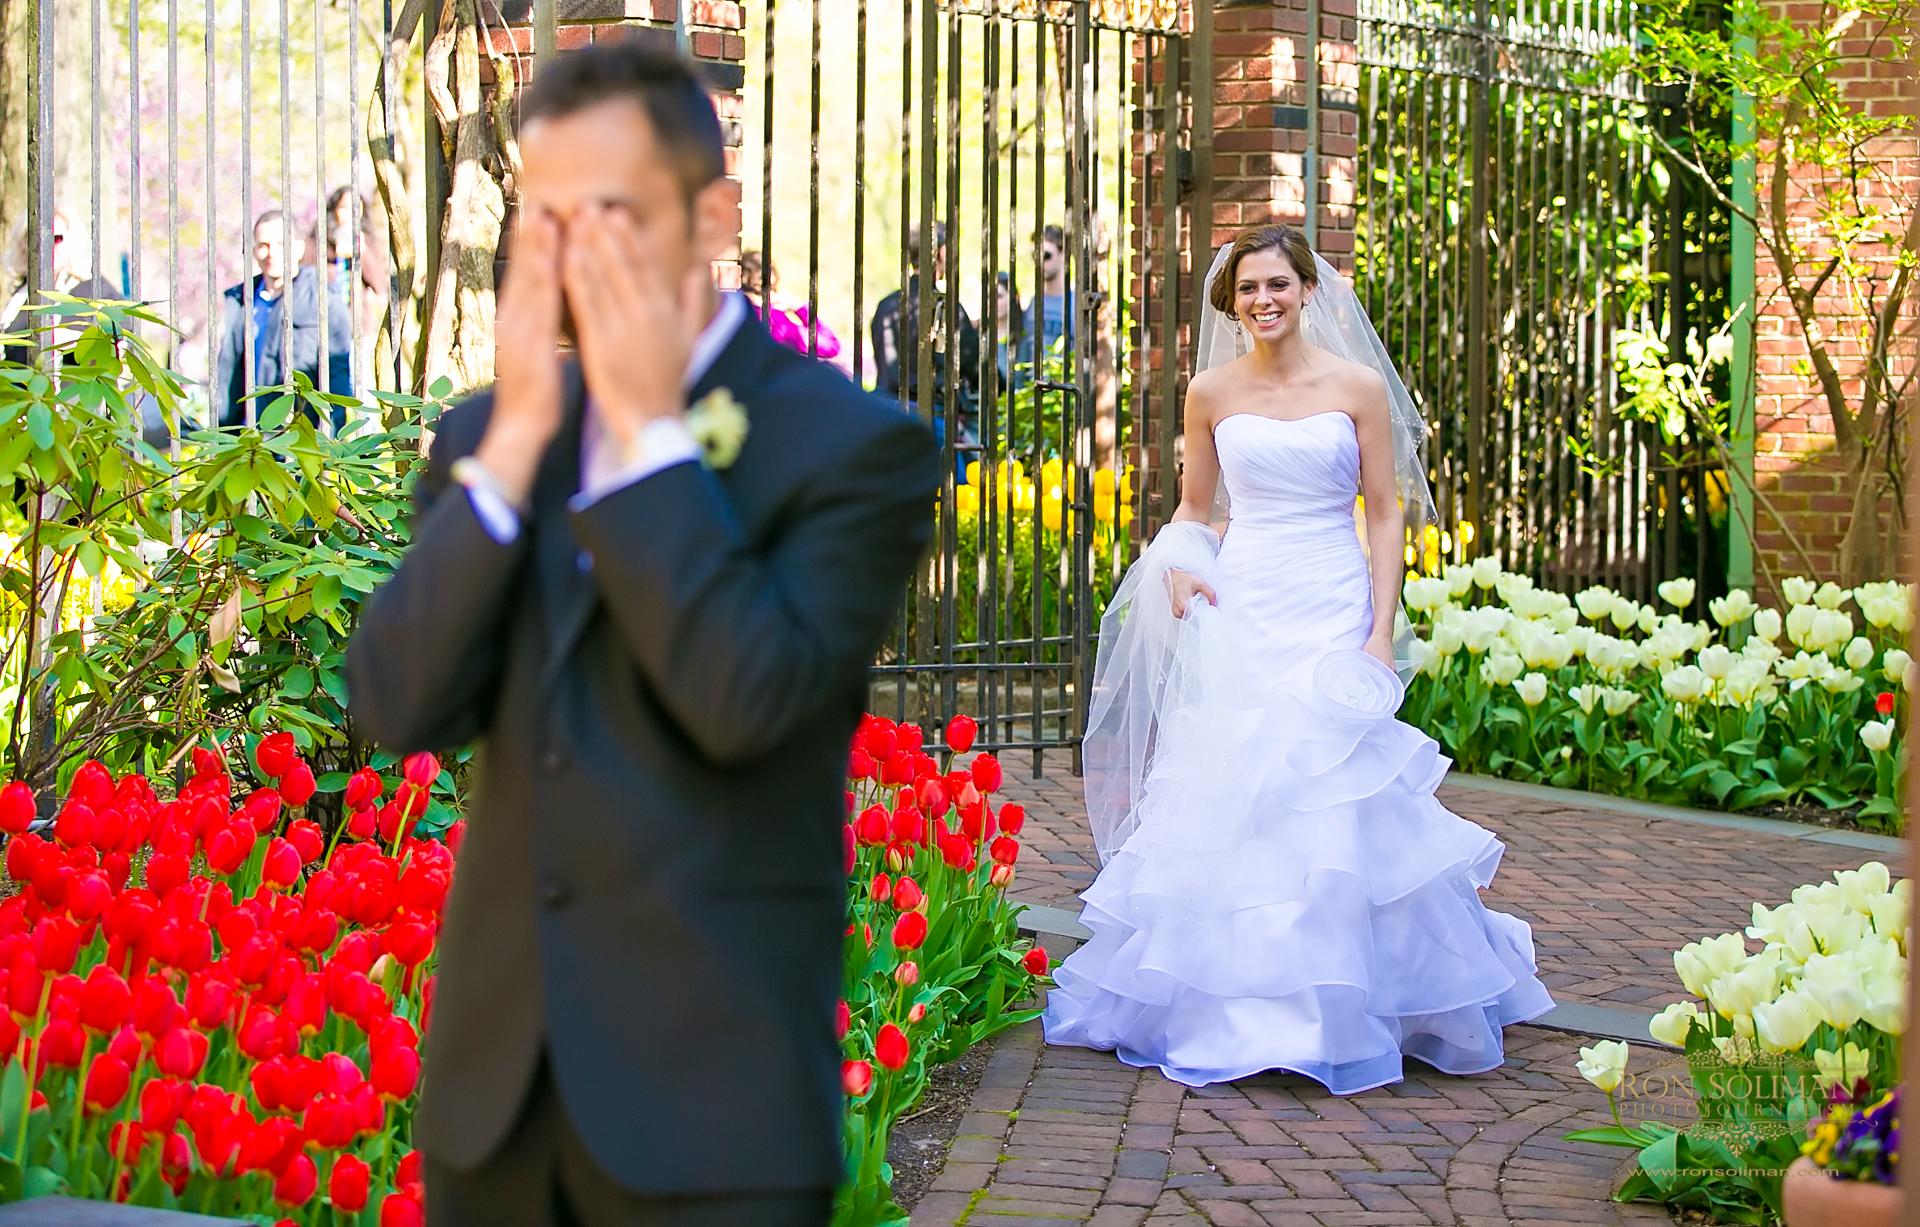 The Loeb Boathouse at Central Park Wedding | Linda + Samir